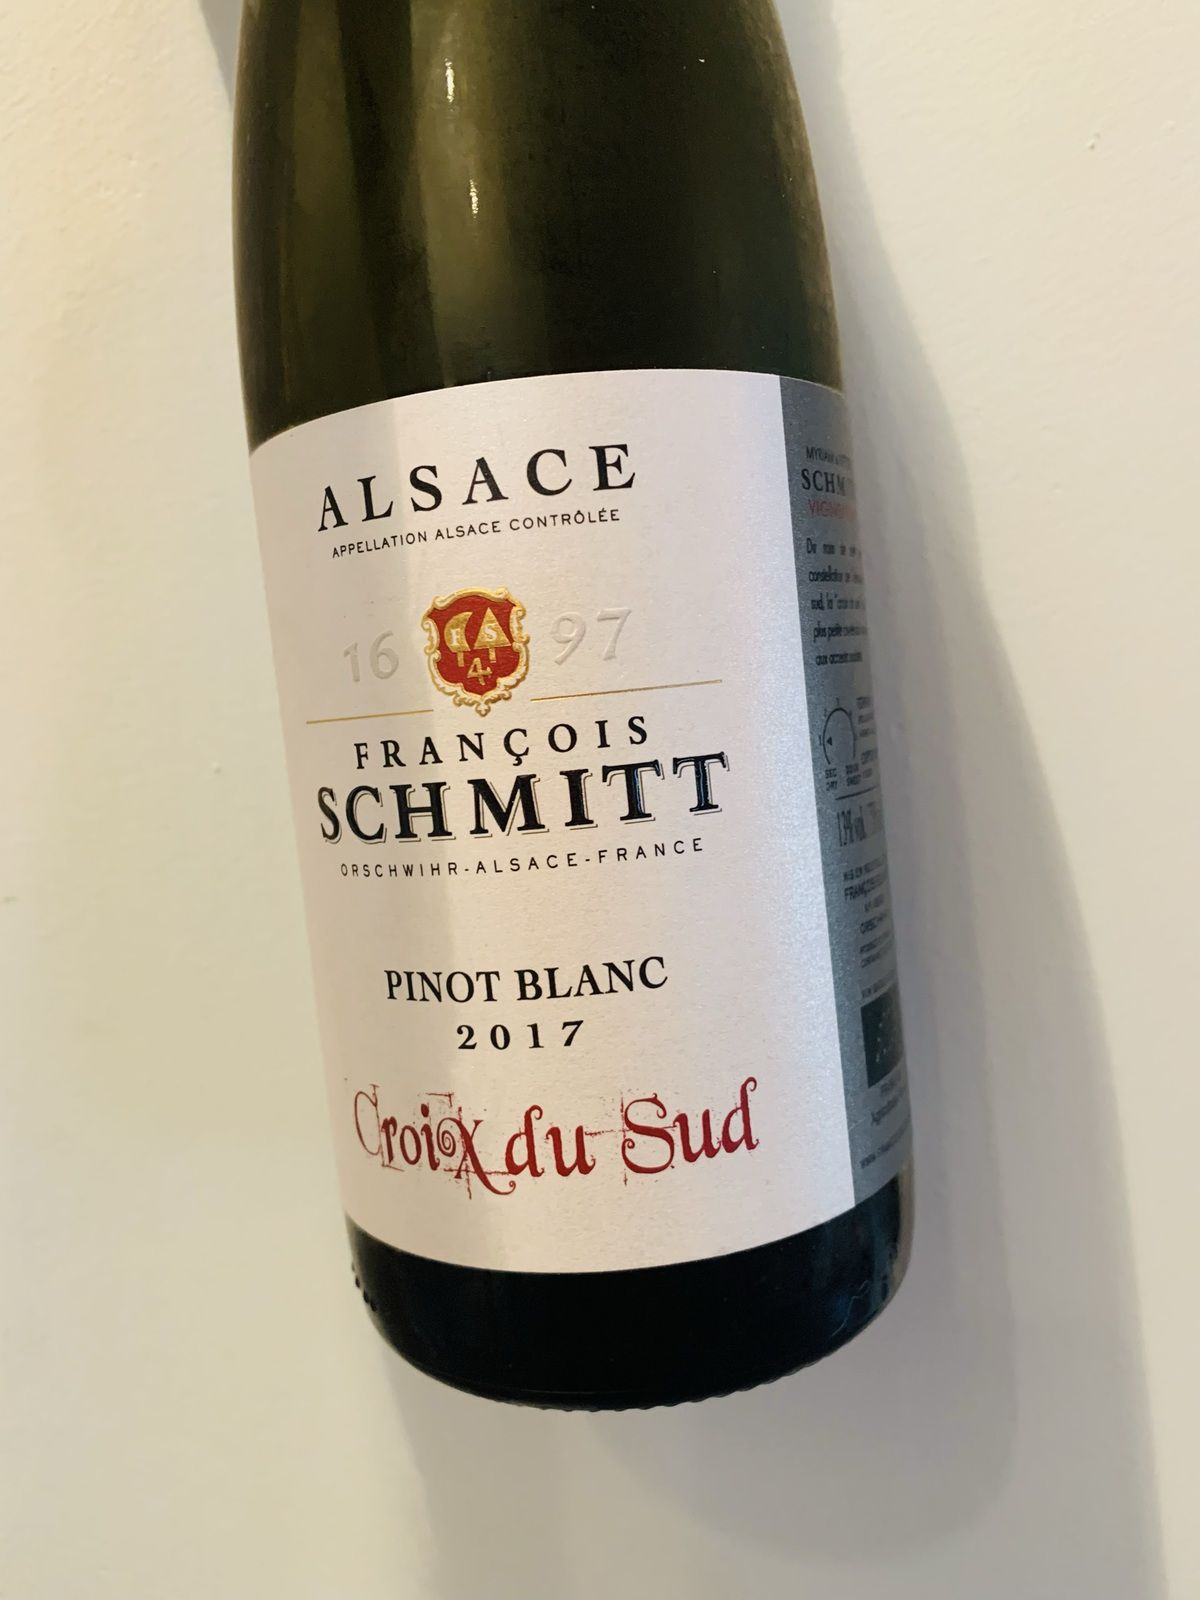 Alsace pinot blanc croix du Sud 2017 François Schmitt